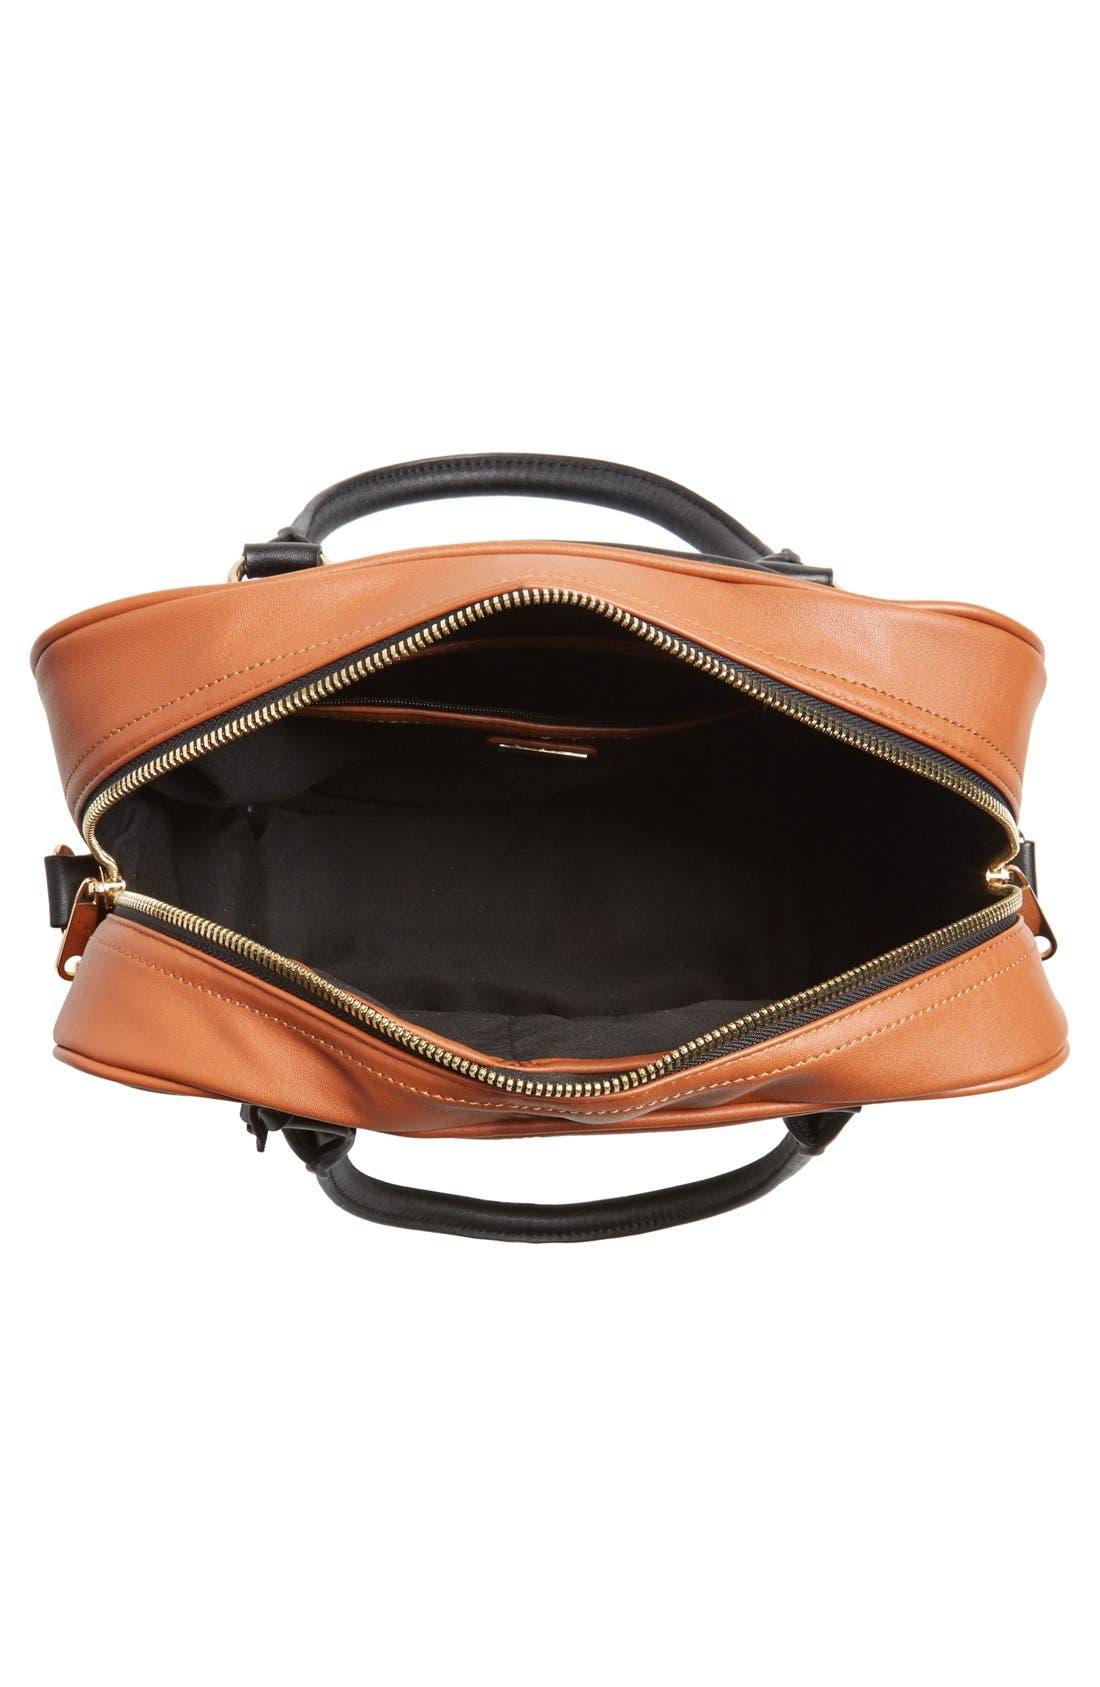 Alternate Image 3  - kensie 'Block Party' Color Block Handbag